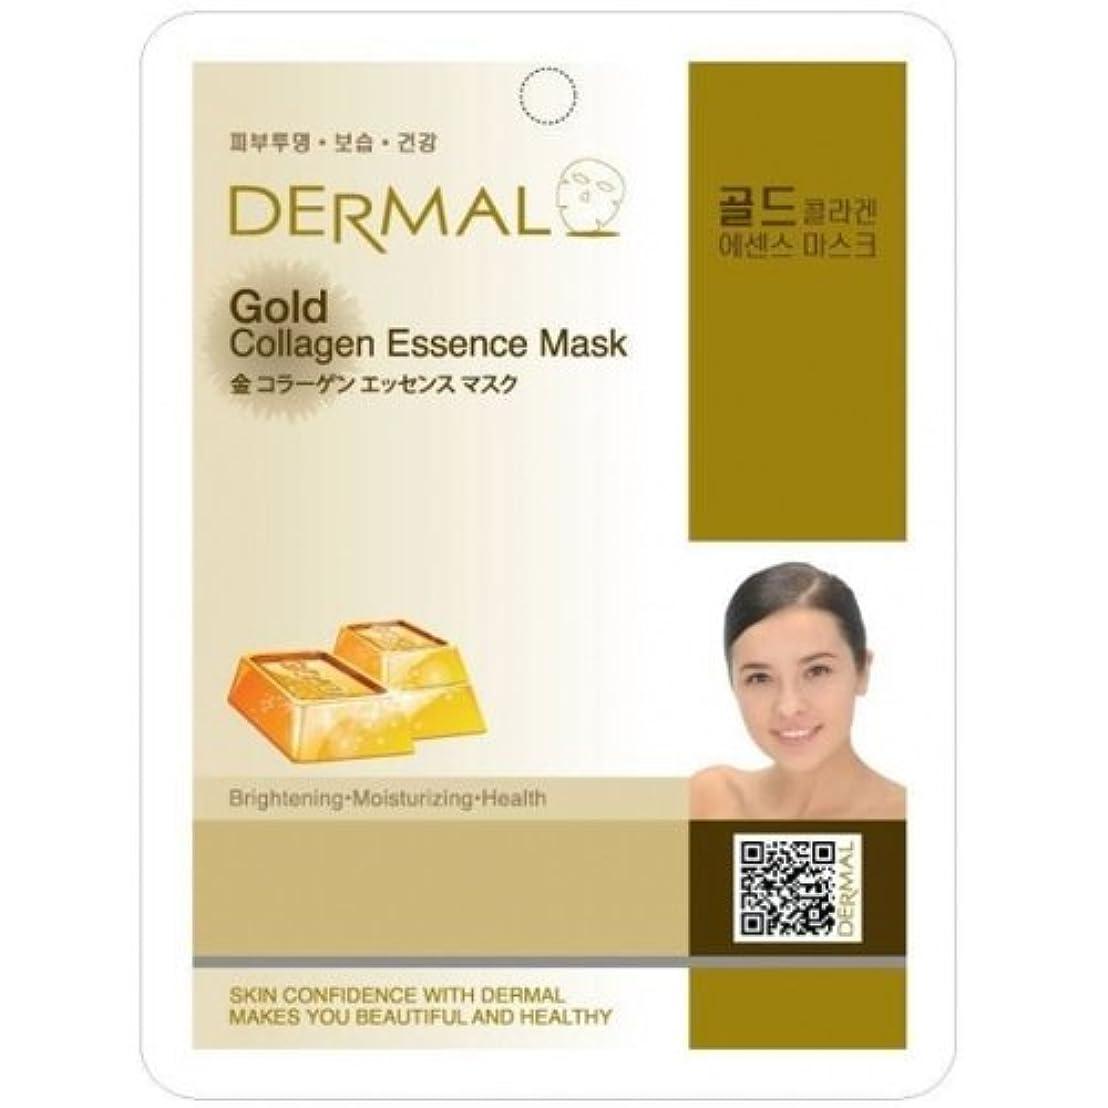 【DERMAL】ダーマル シートマスク 金10枚セット/保湿/フェイスマスク/フェイスパック/マスクパック/韓国コスメ [メール便]